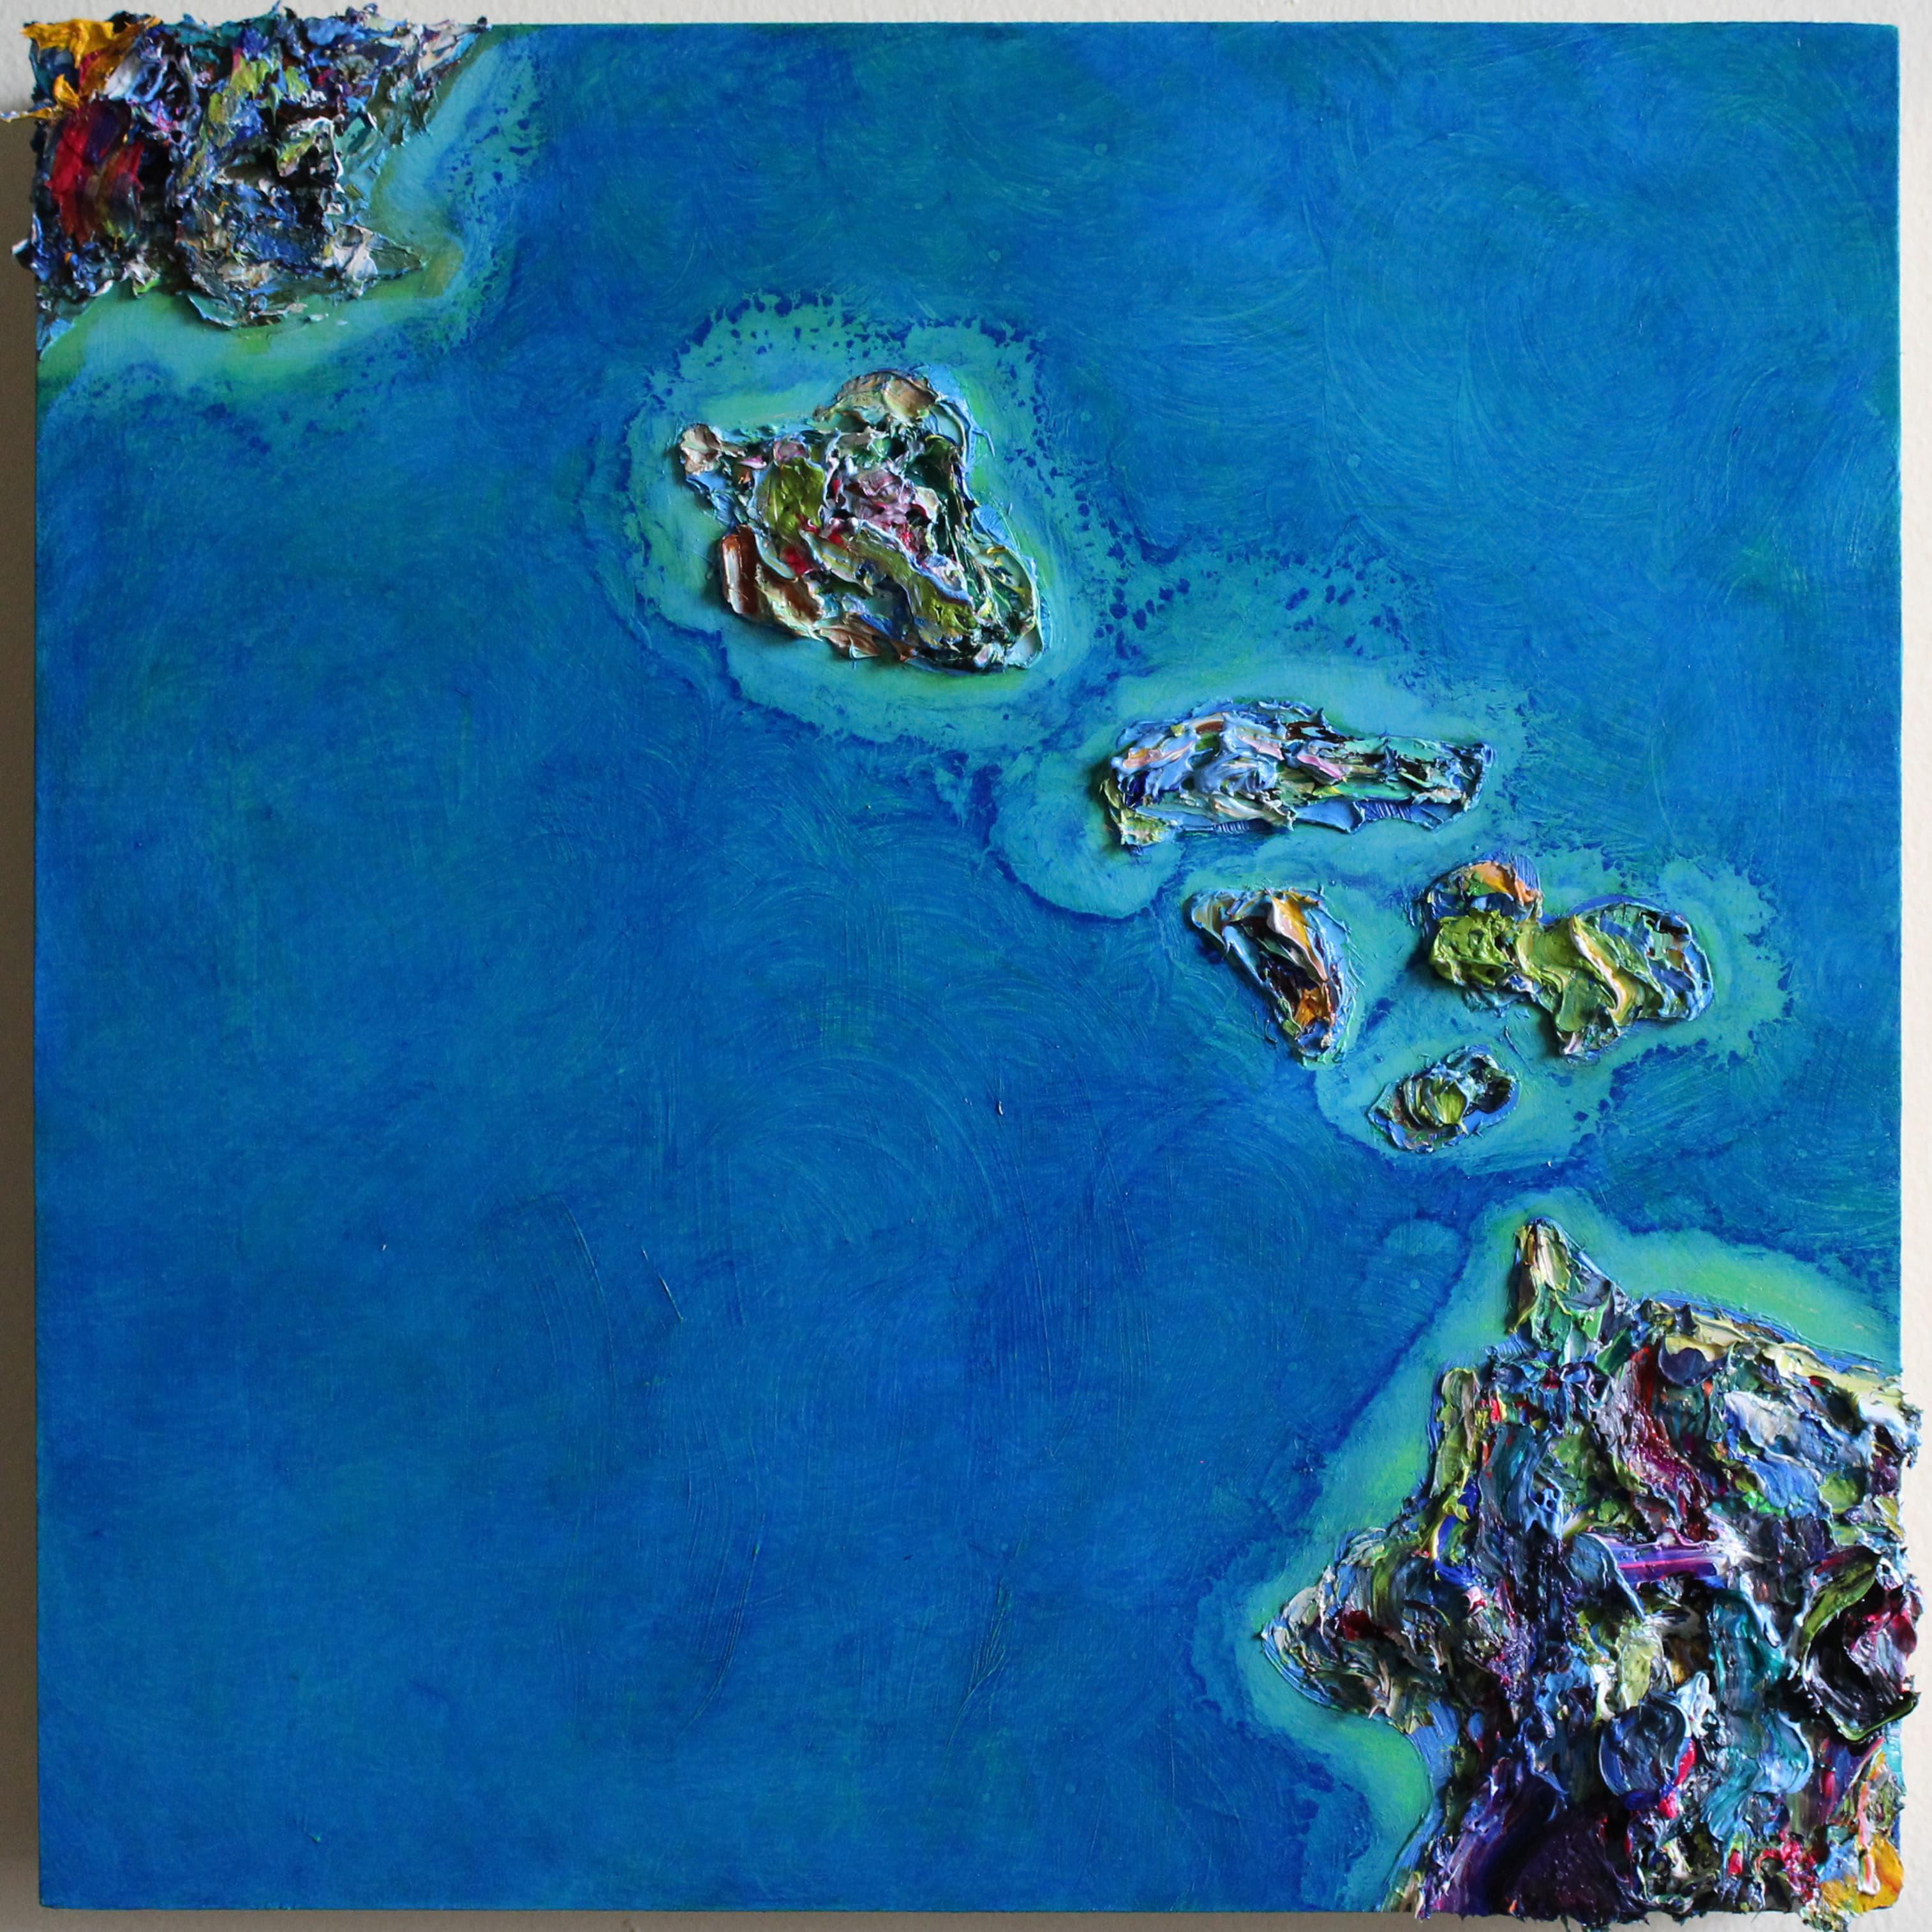 """Hawaii"" by Michael Serafino/http://mikafino.com"